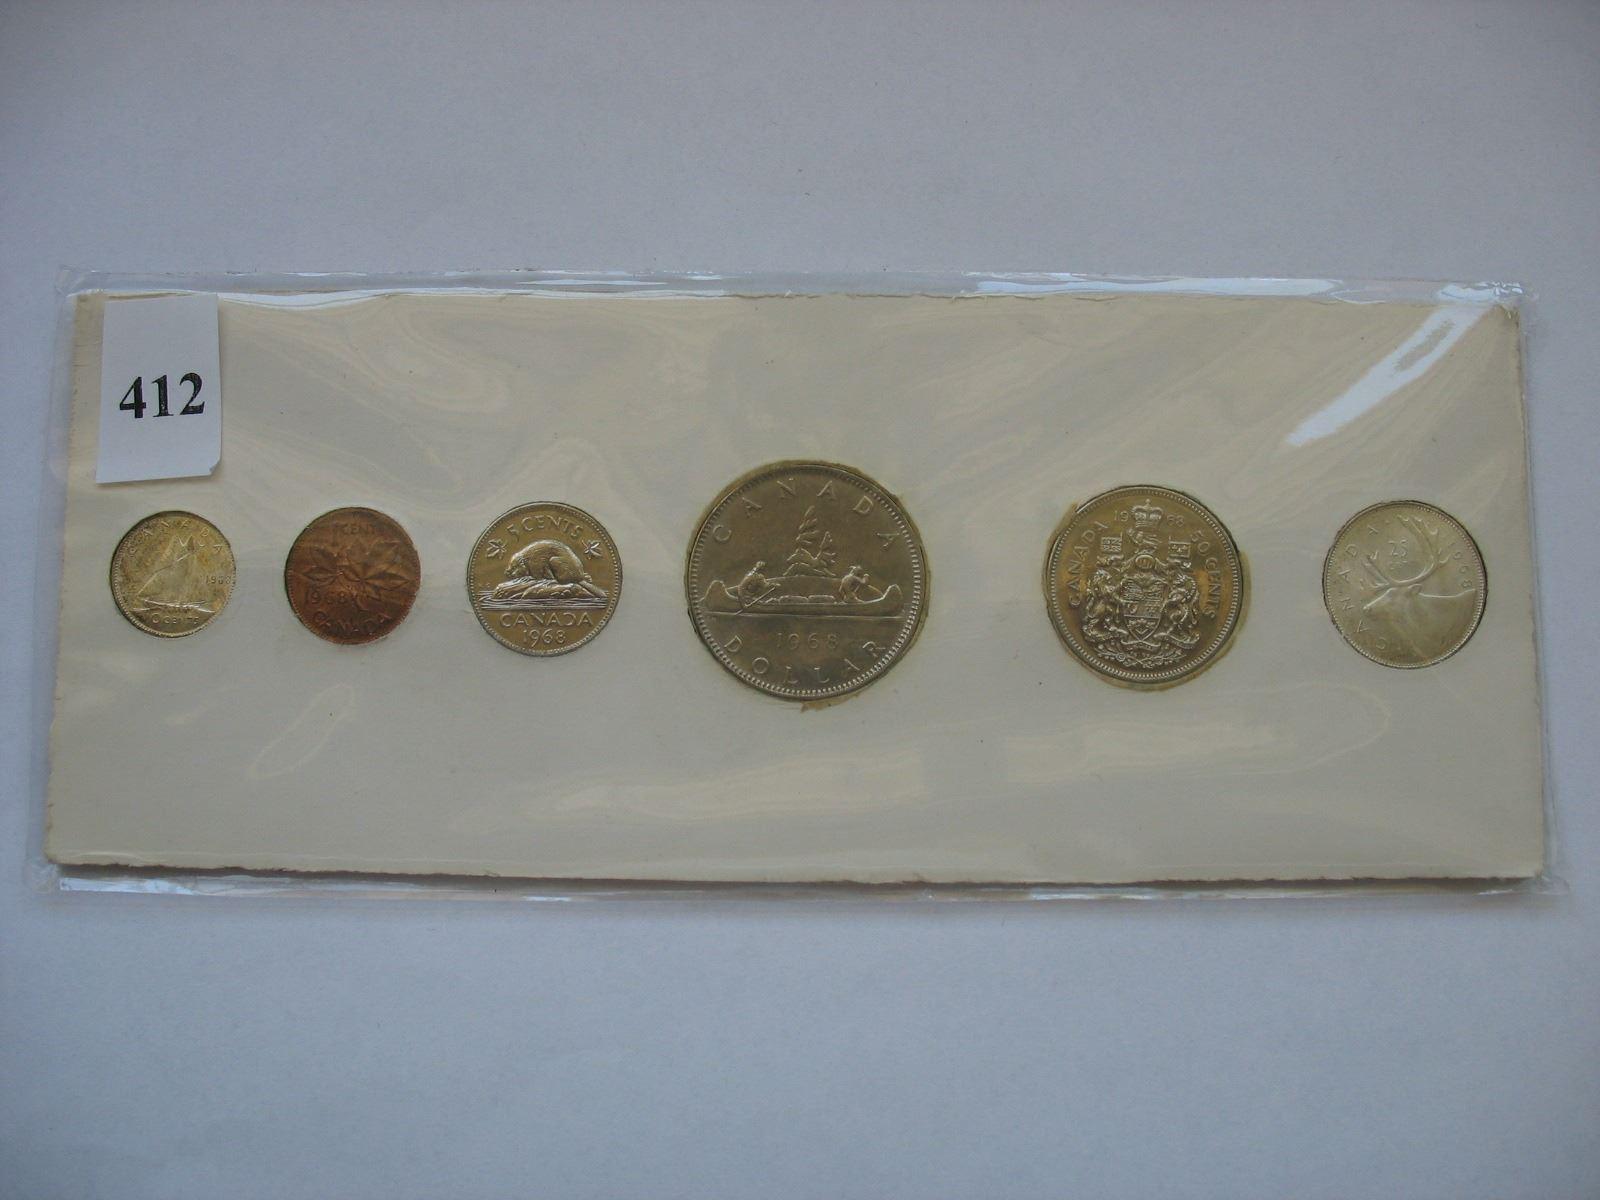 1968 Canadian Coin Set - Silver Quarter & Dime